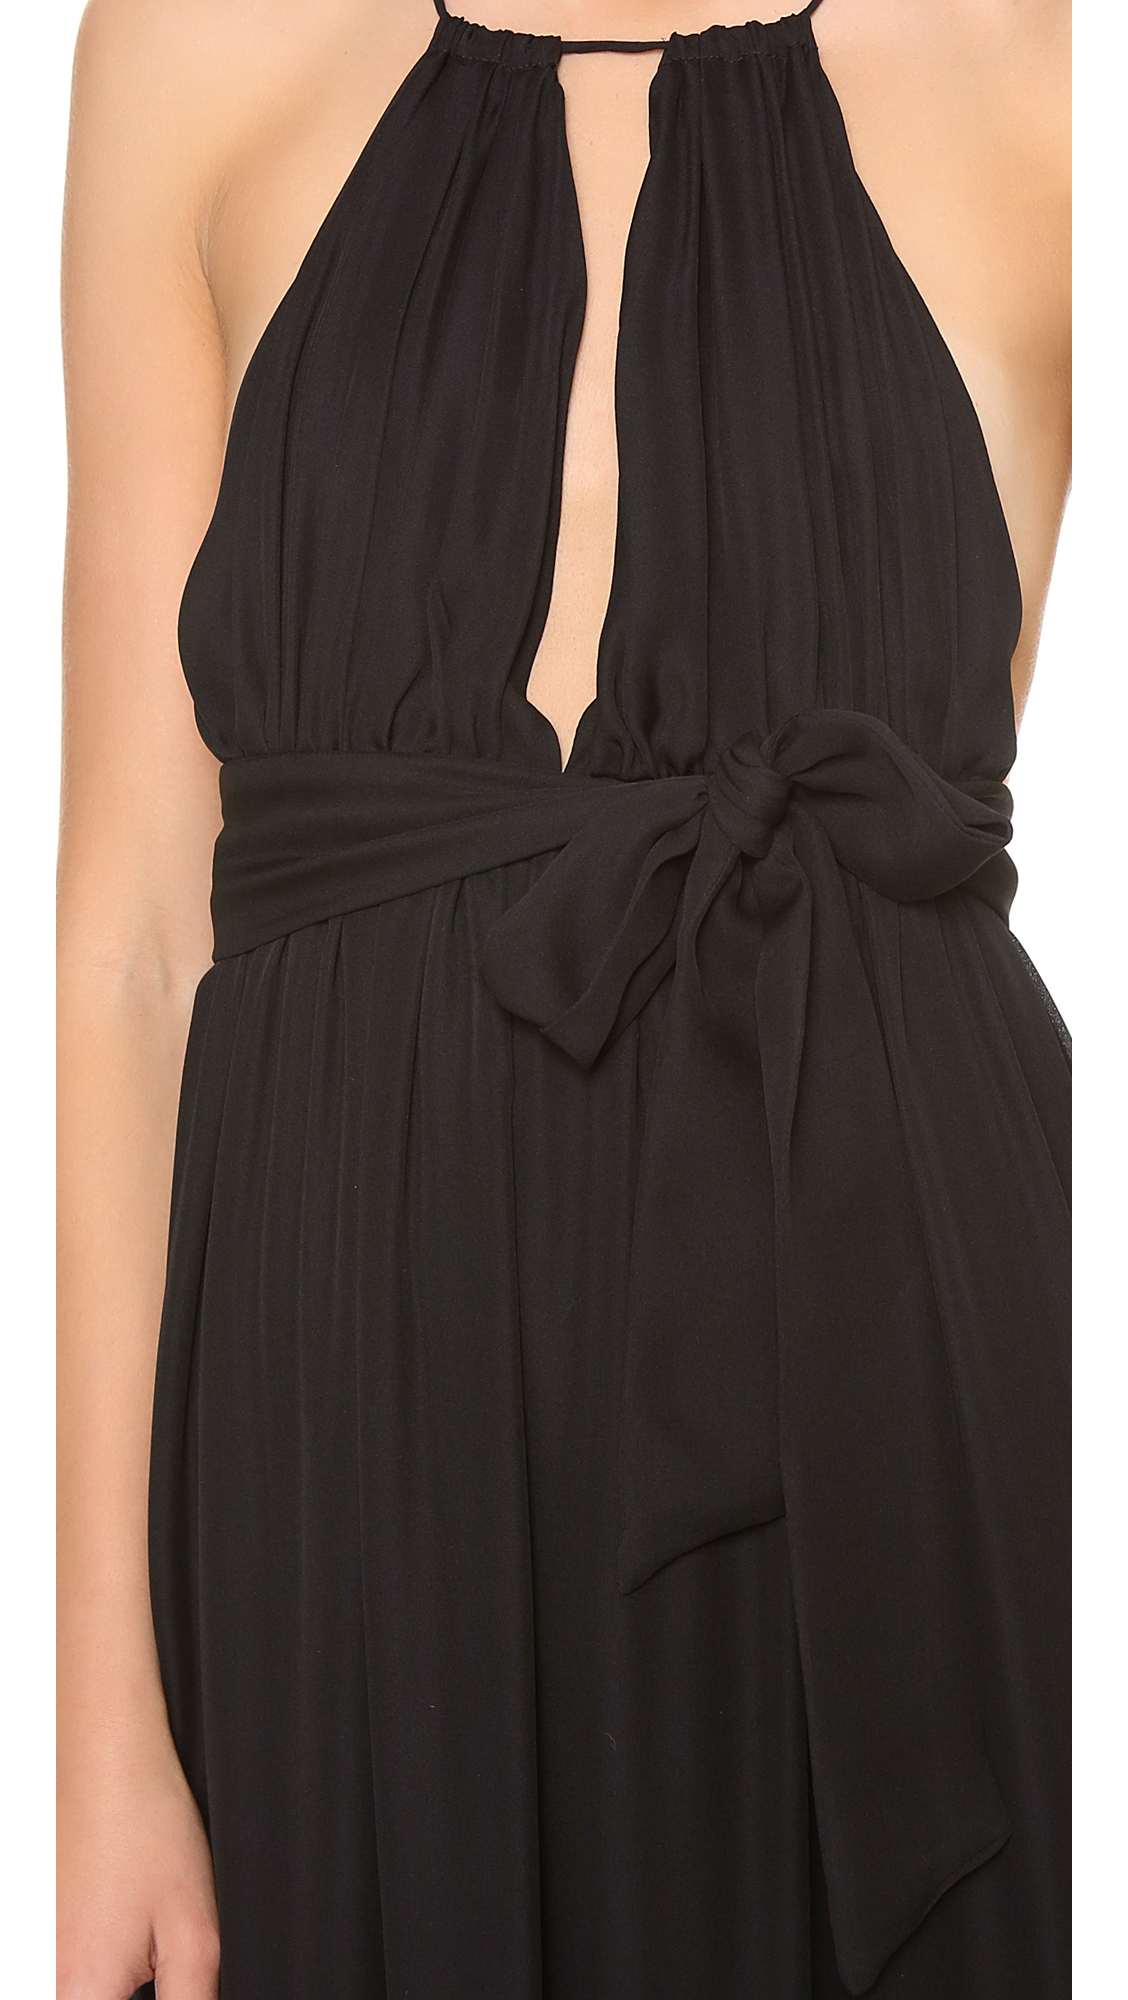 Lyst - Ramy Brook Milan Gown In Black-8303